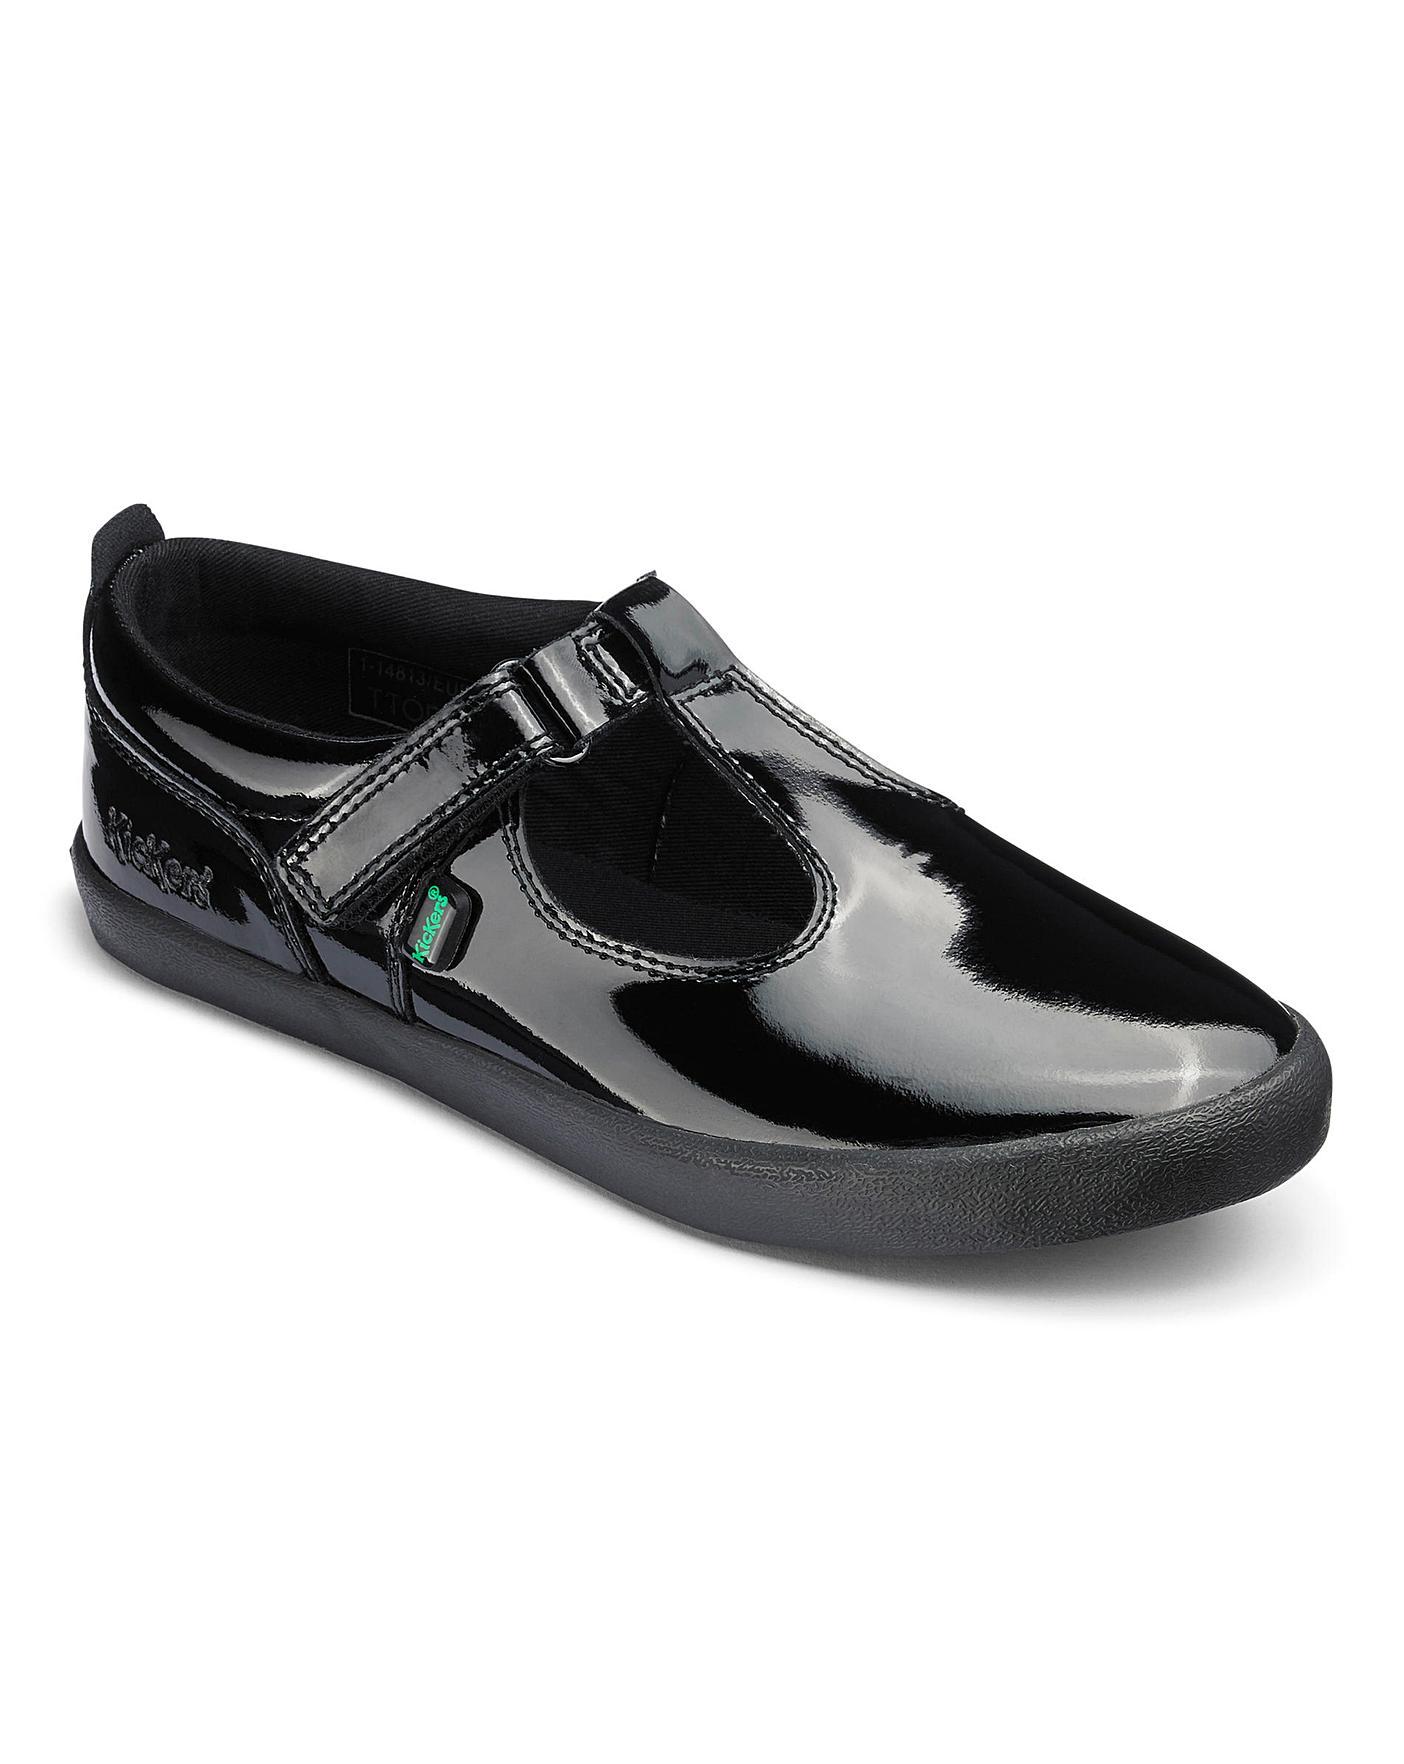 Kickers Kariko T-Bar Shoes | Oxendales